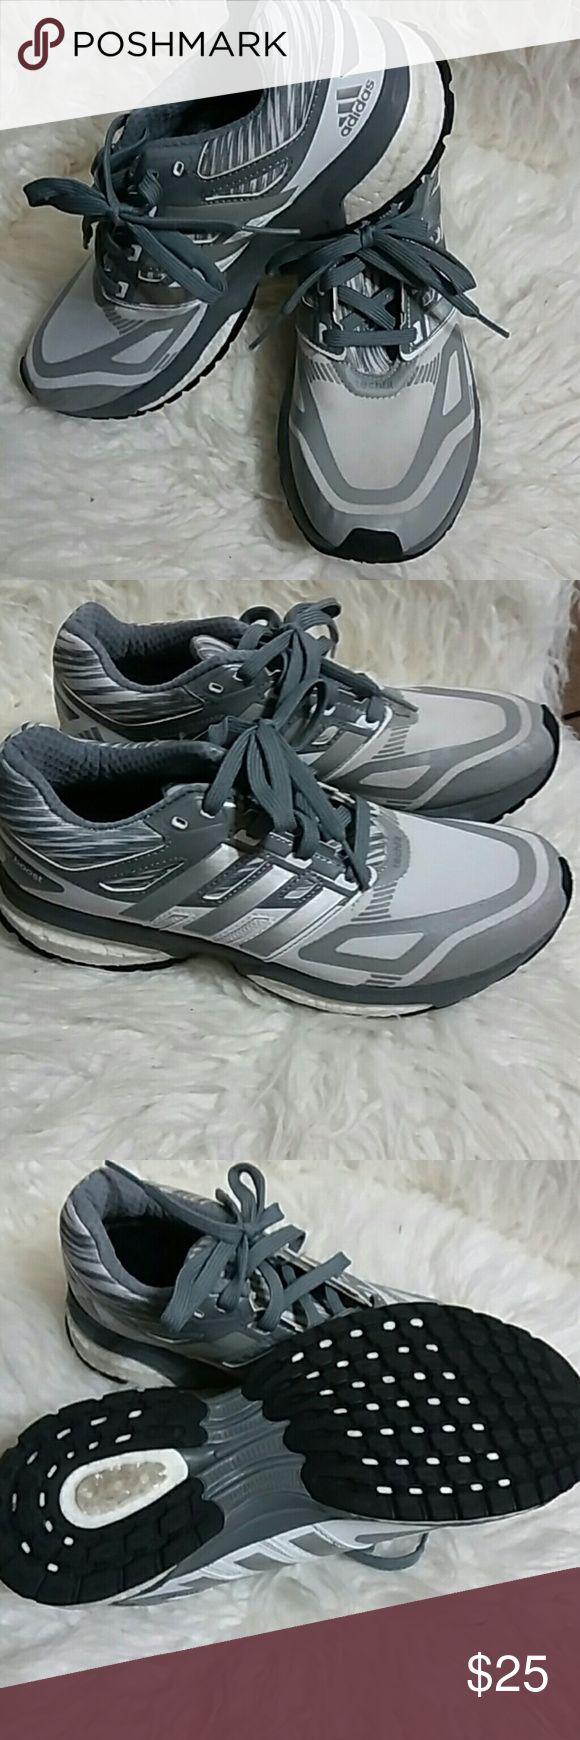 best service 58c09 eebdb Via  fashionzine  Adidas boost running shoes. Adidas Impulso Zapatos Para  CorrerAdidas .